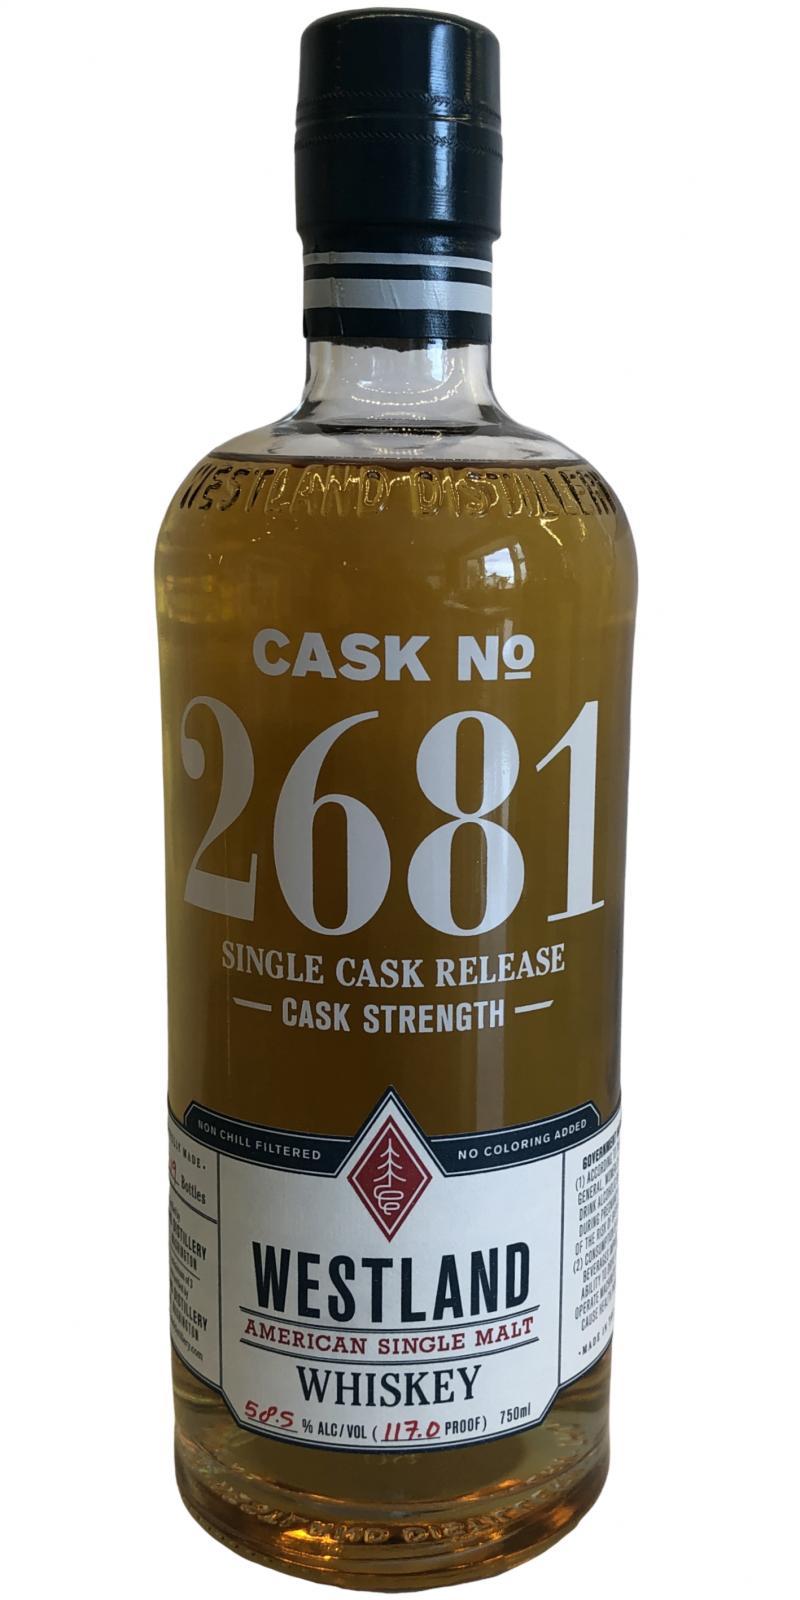 Westland Cask No. 2681 - Golden Promise